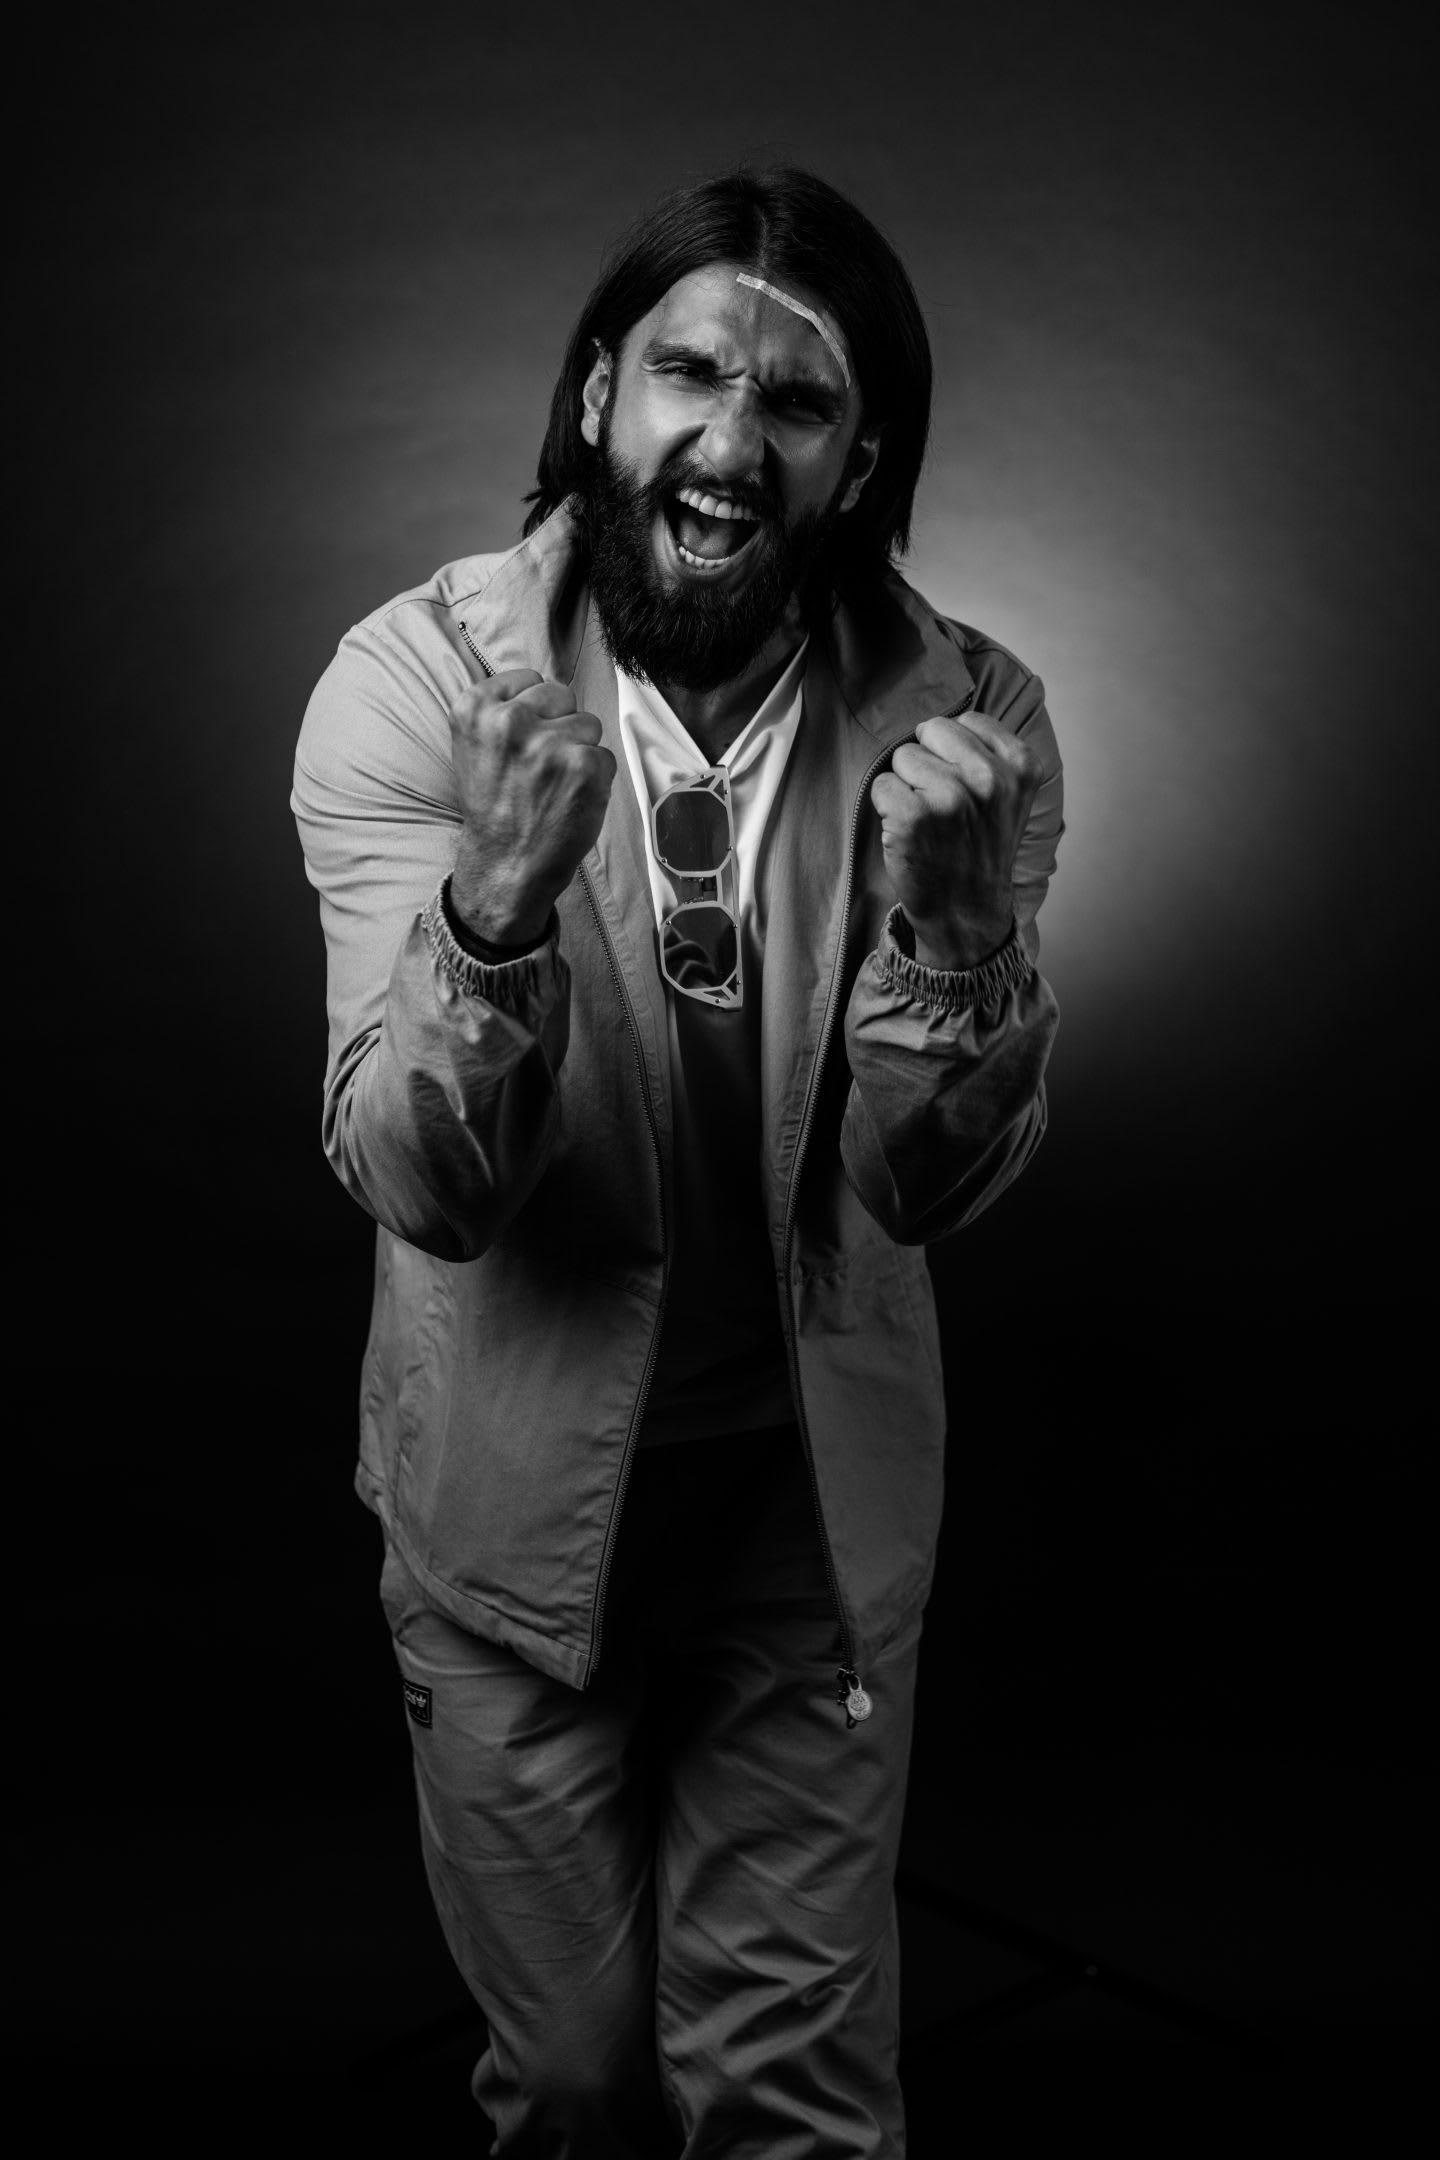 Bollywood actor Ranveer Singh cheering black and white shot_adidas_Interview_GamePlanA, success, career